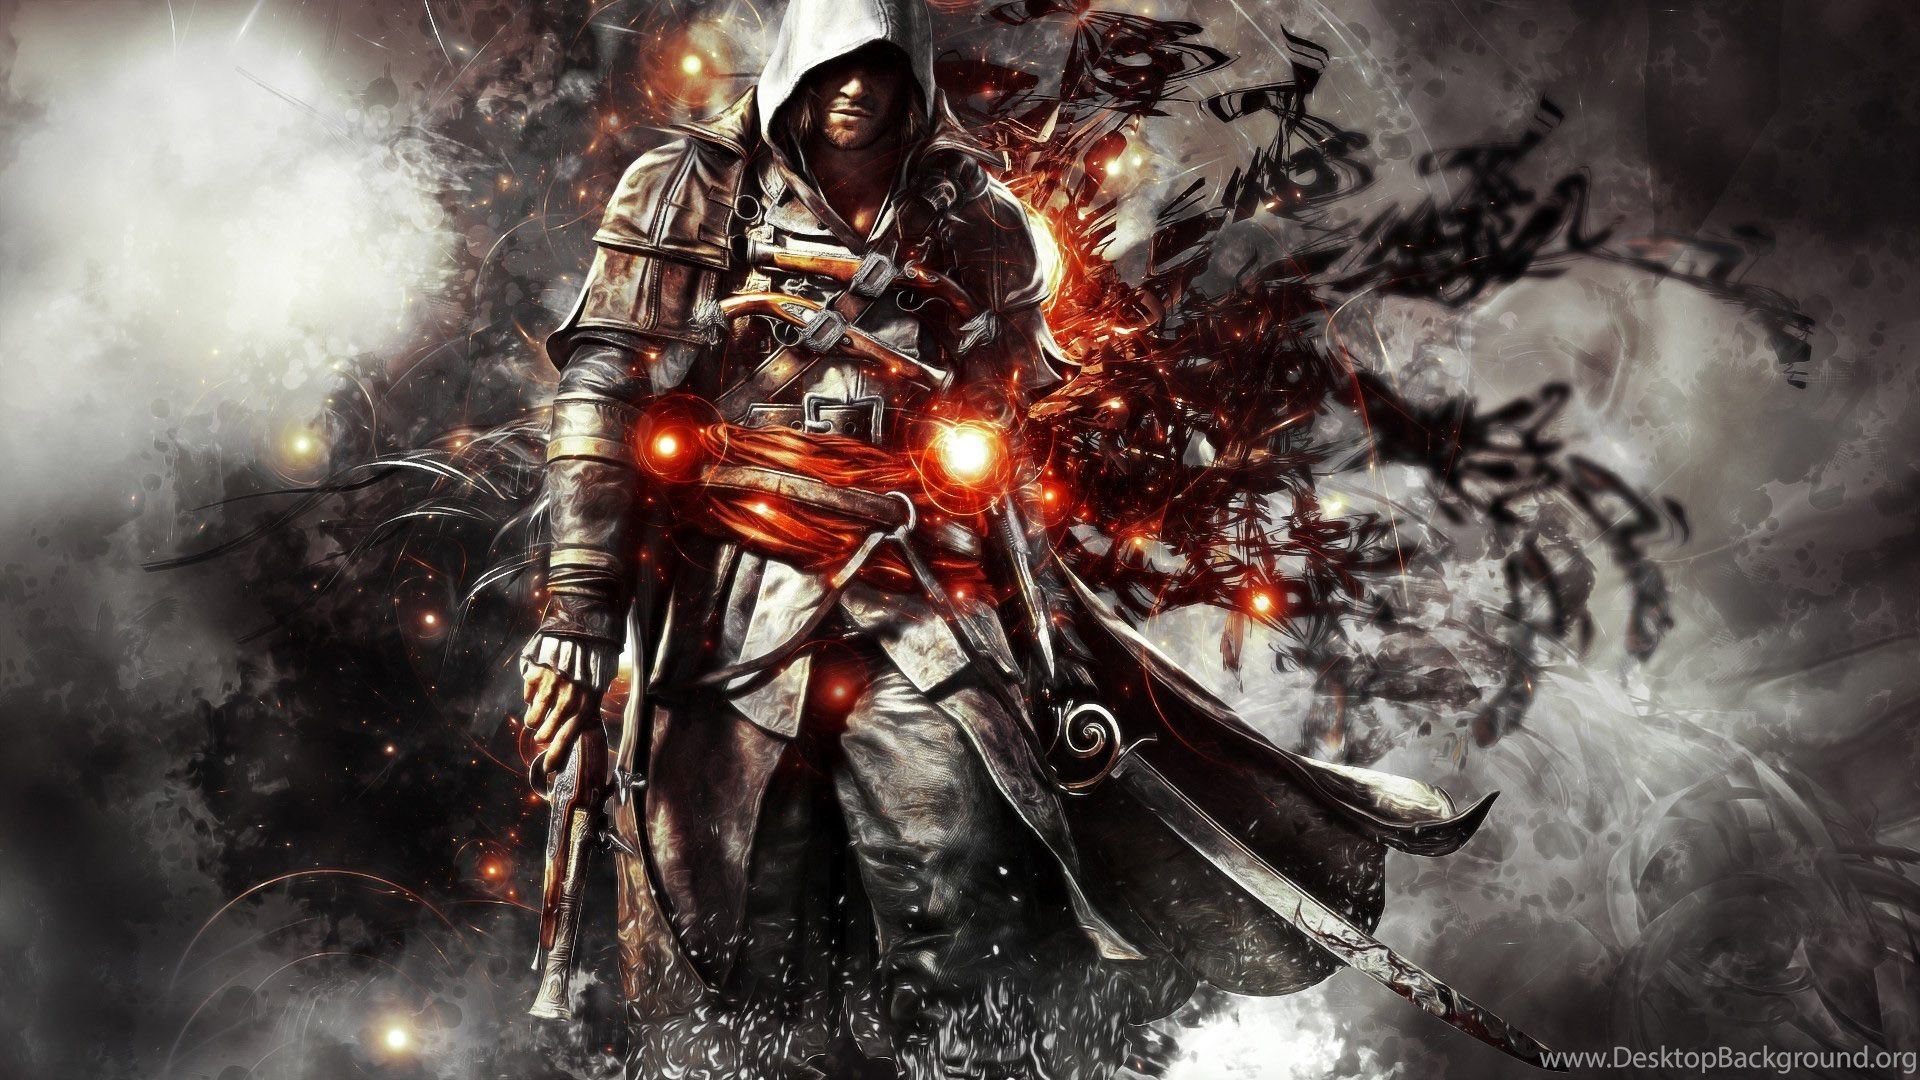 Assassins Creed Desktop Backgrounds Wallpapers Cave Desktop Background